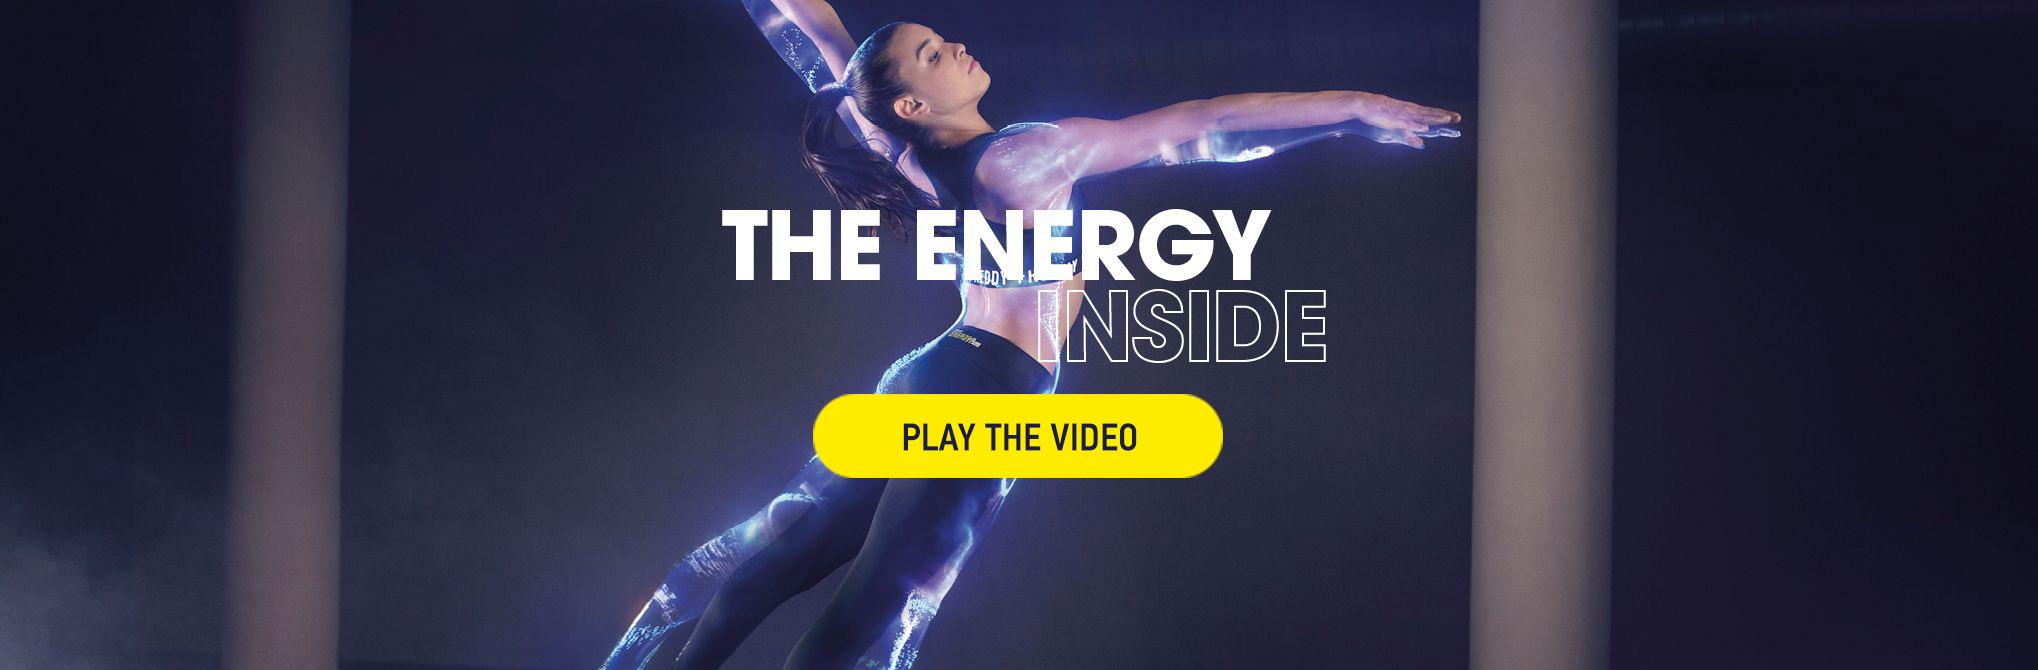 The Energy Inside - VIDEO